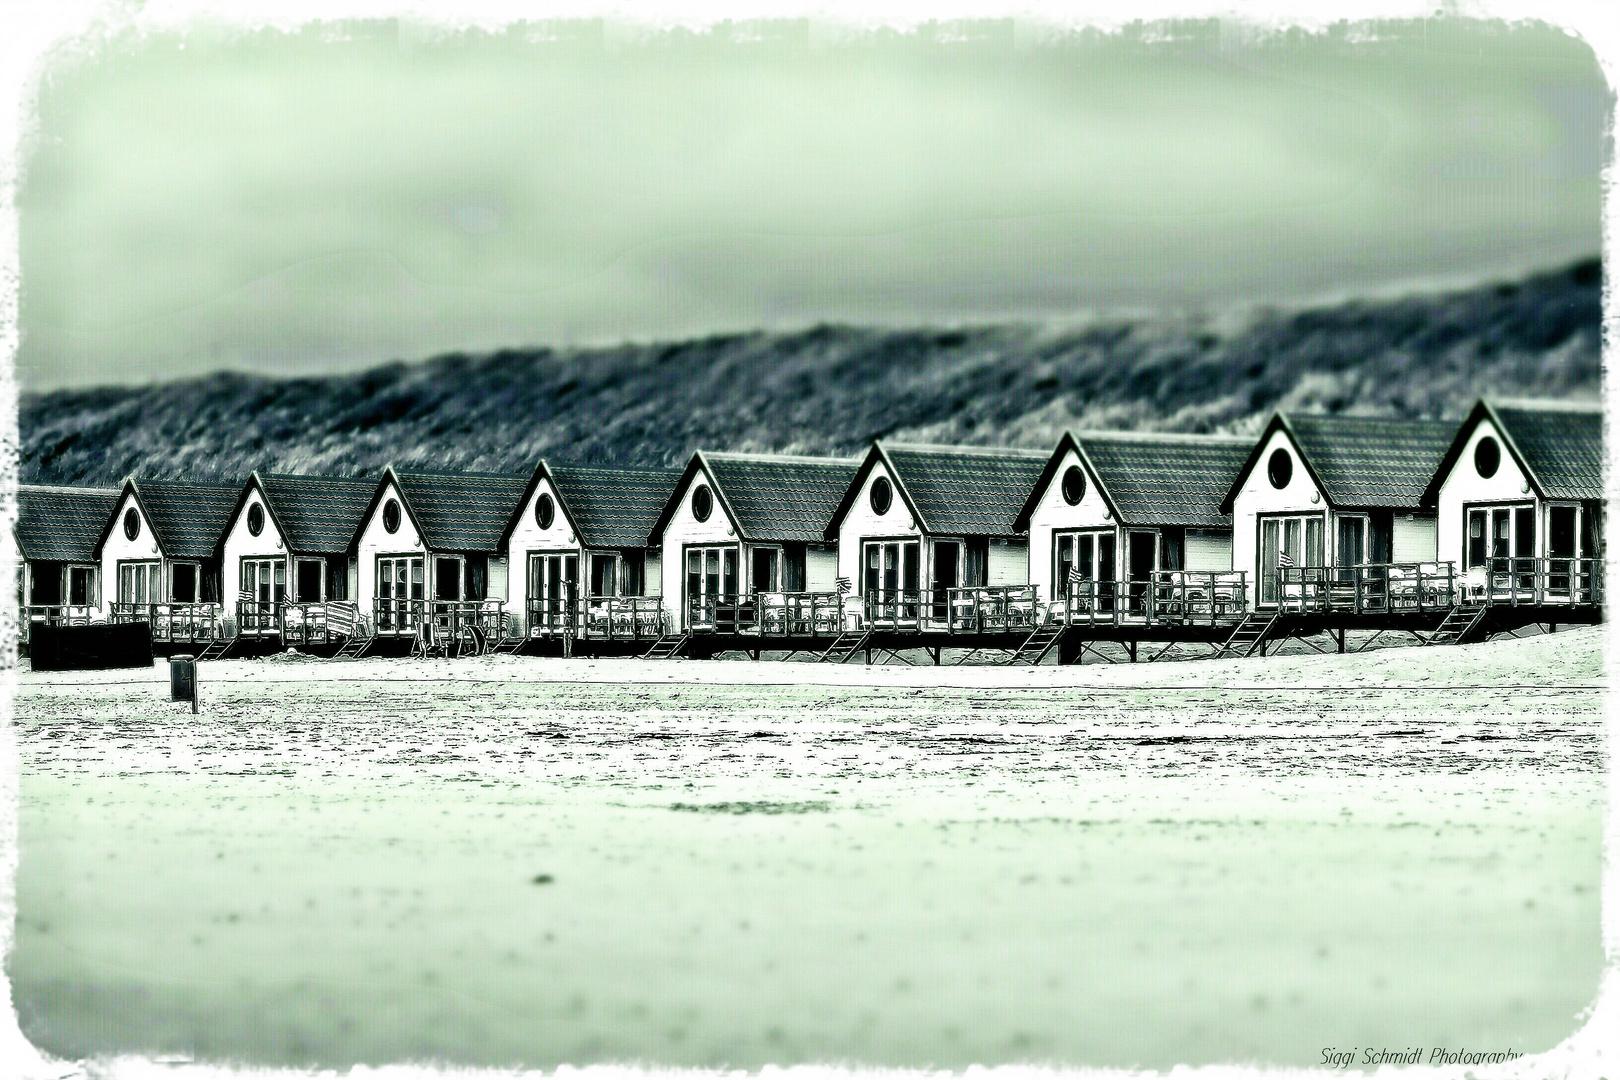 Am Strand der Nordsee / NL